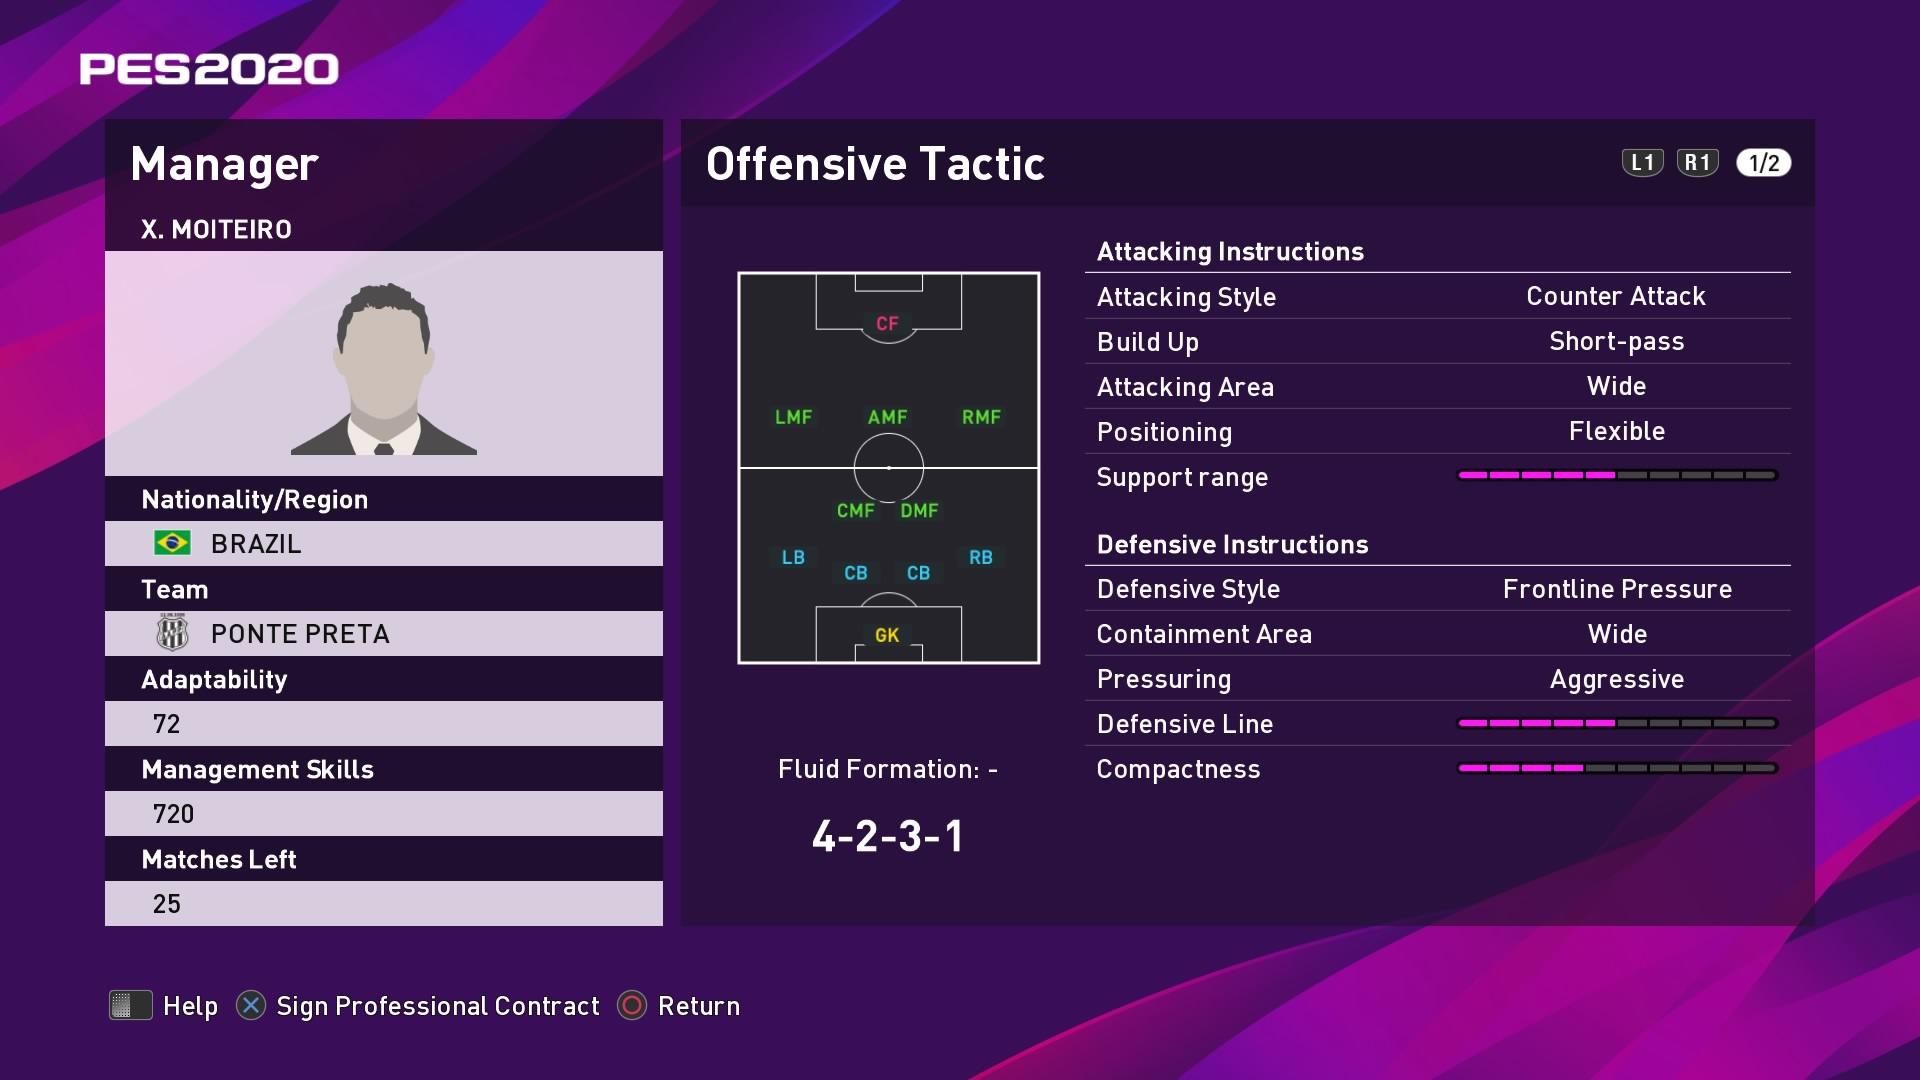 X. Moiteiro (João Brigatti) Offensive Tactic in PES 2020 myClub